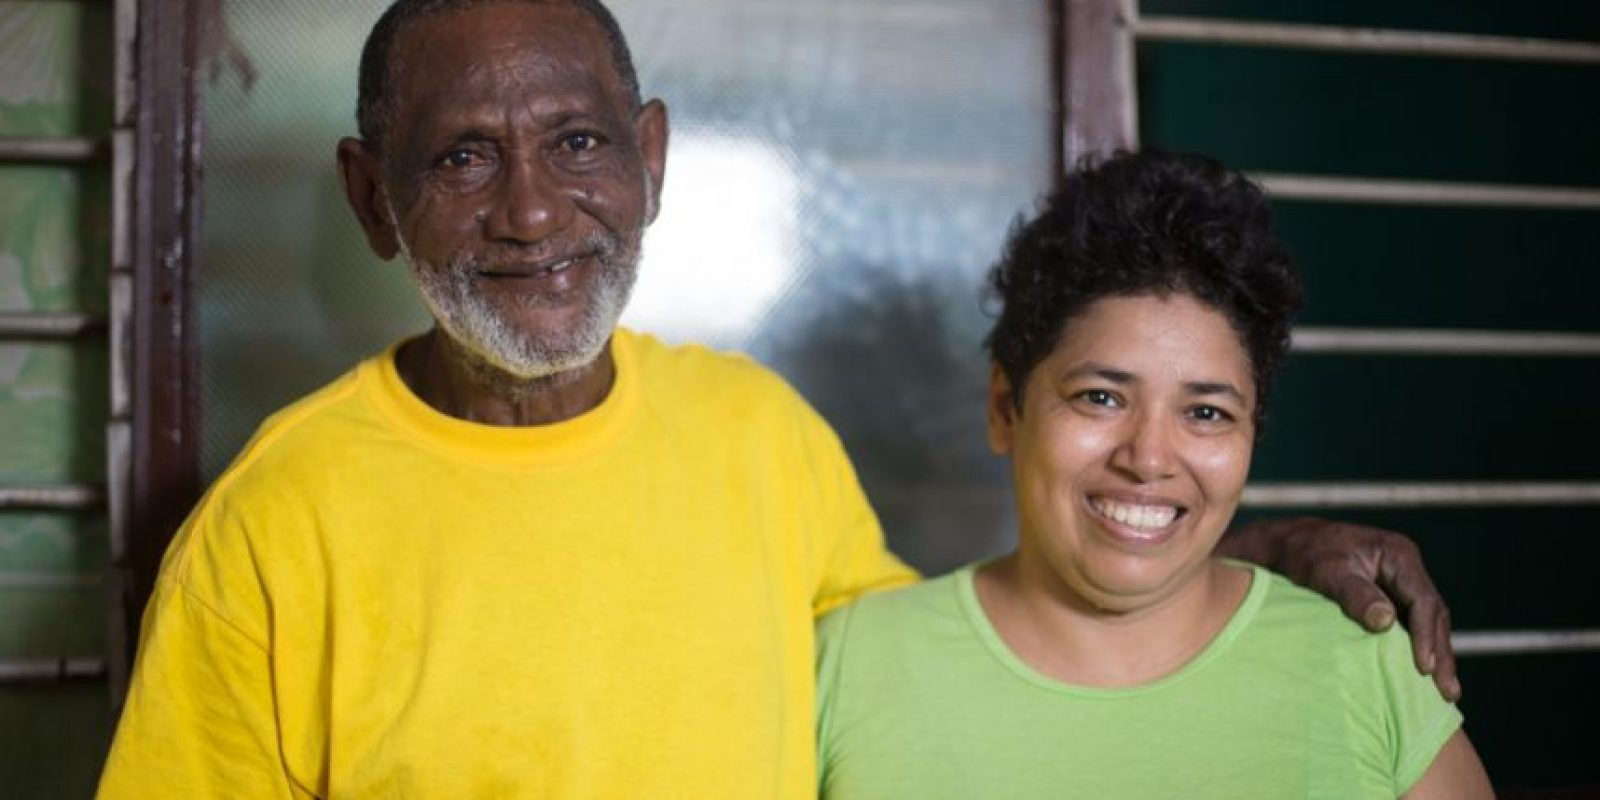 Jorge Reales y Johana Díaz Foto:César Nigrinis Name